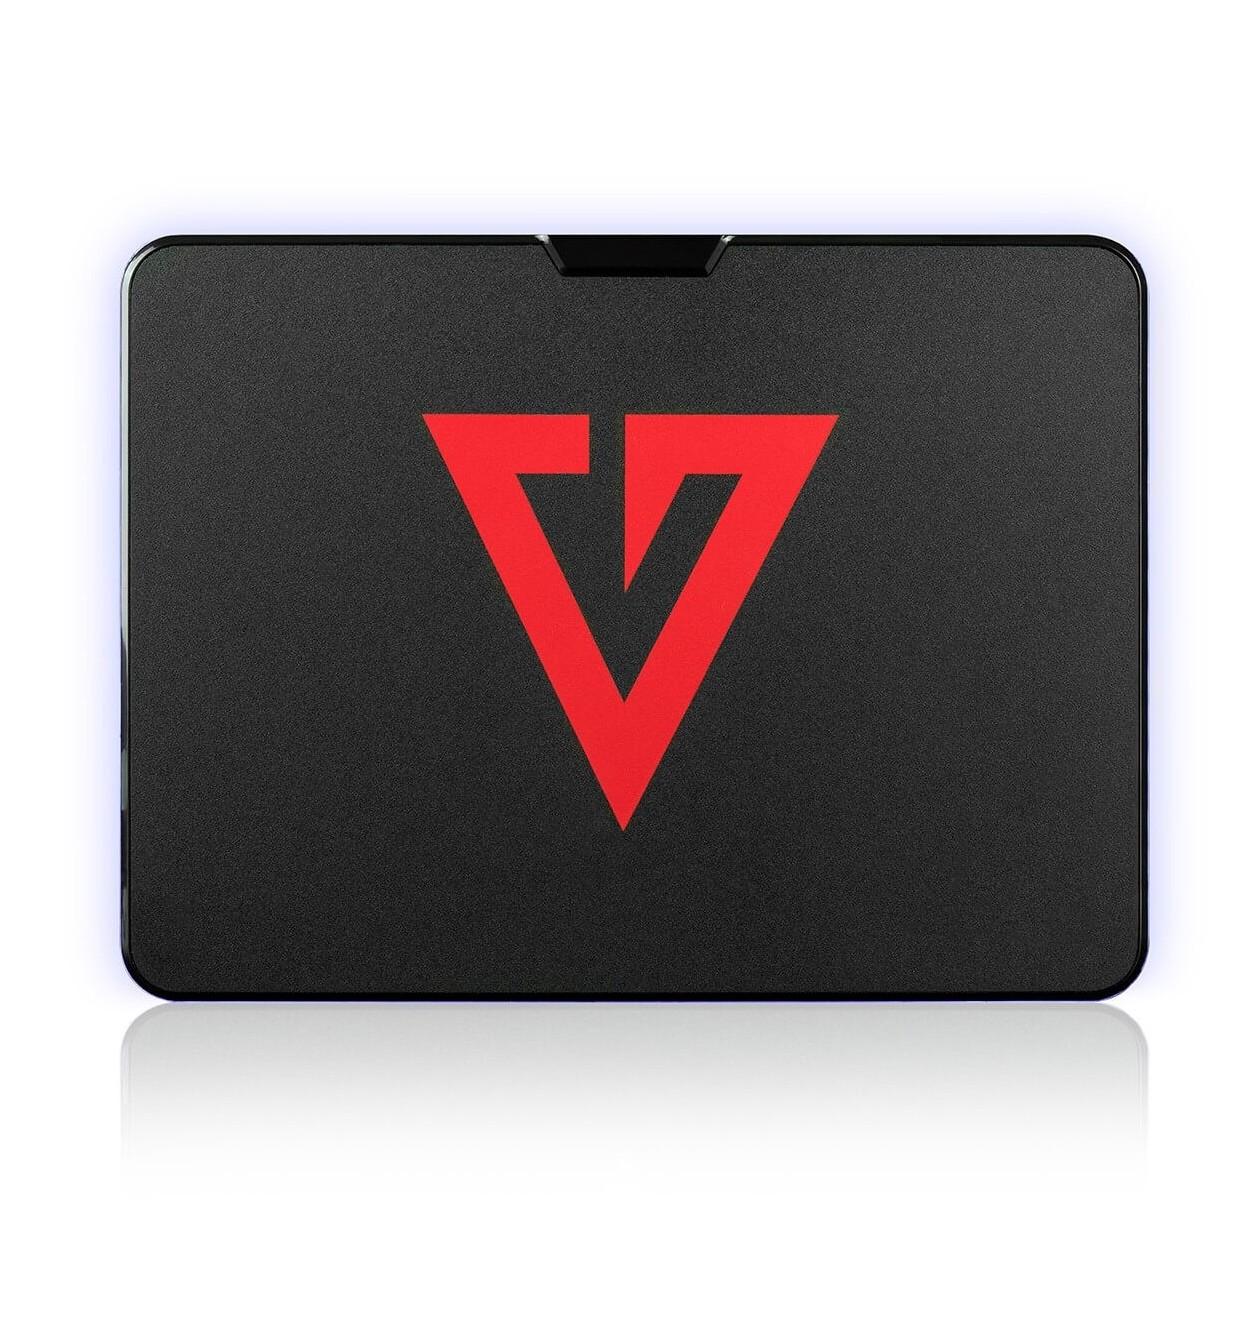 MODECOM Volcano Rift RGB 238x320x5mm Mousepad